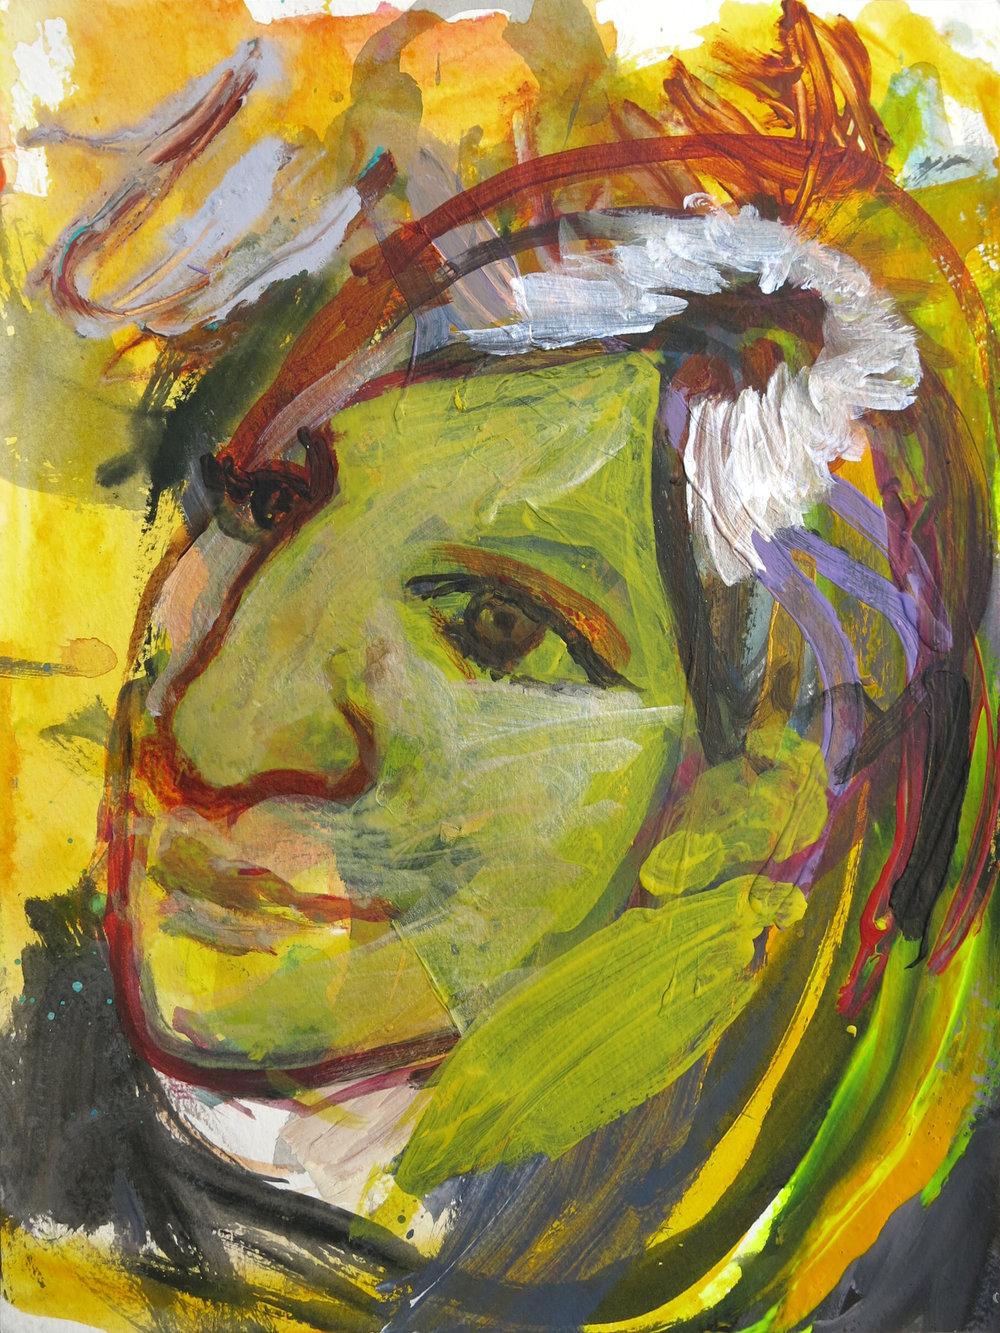 Barbra Streisand Portrait #212